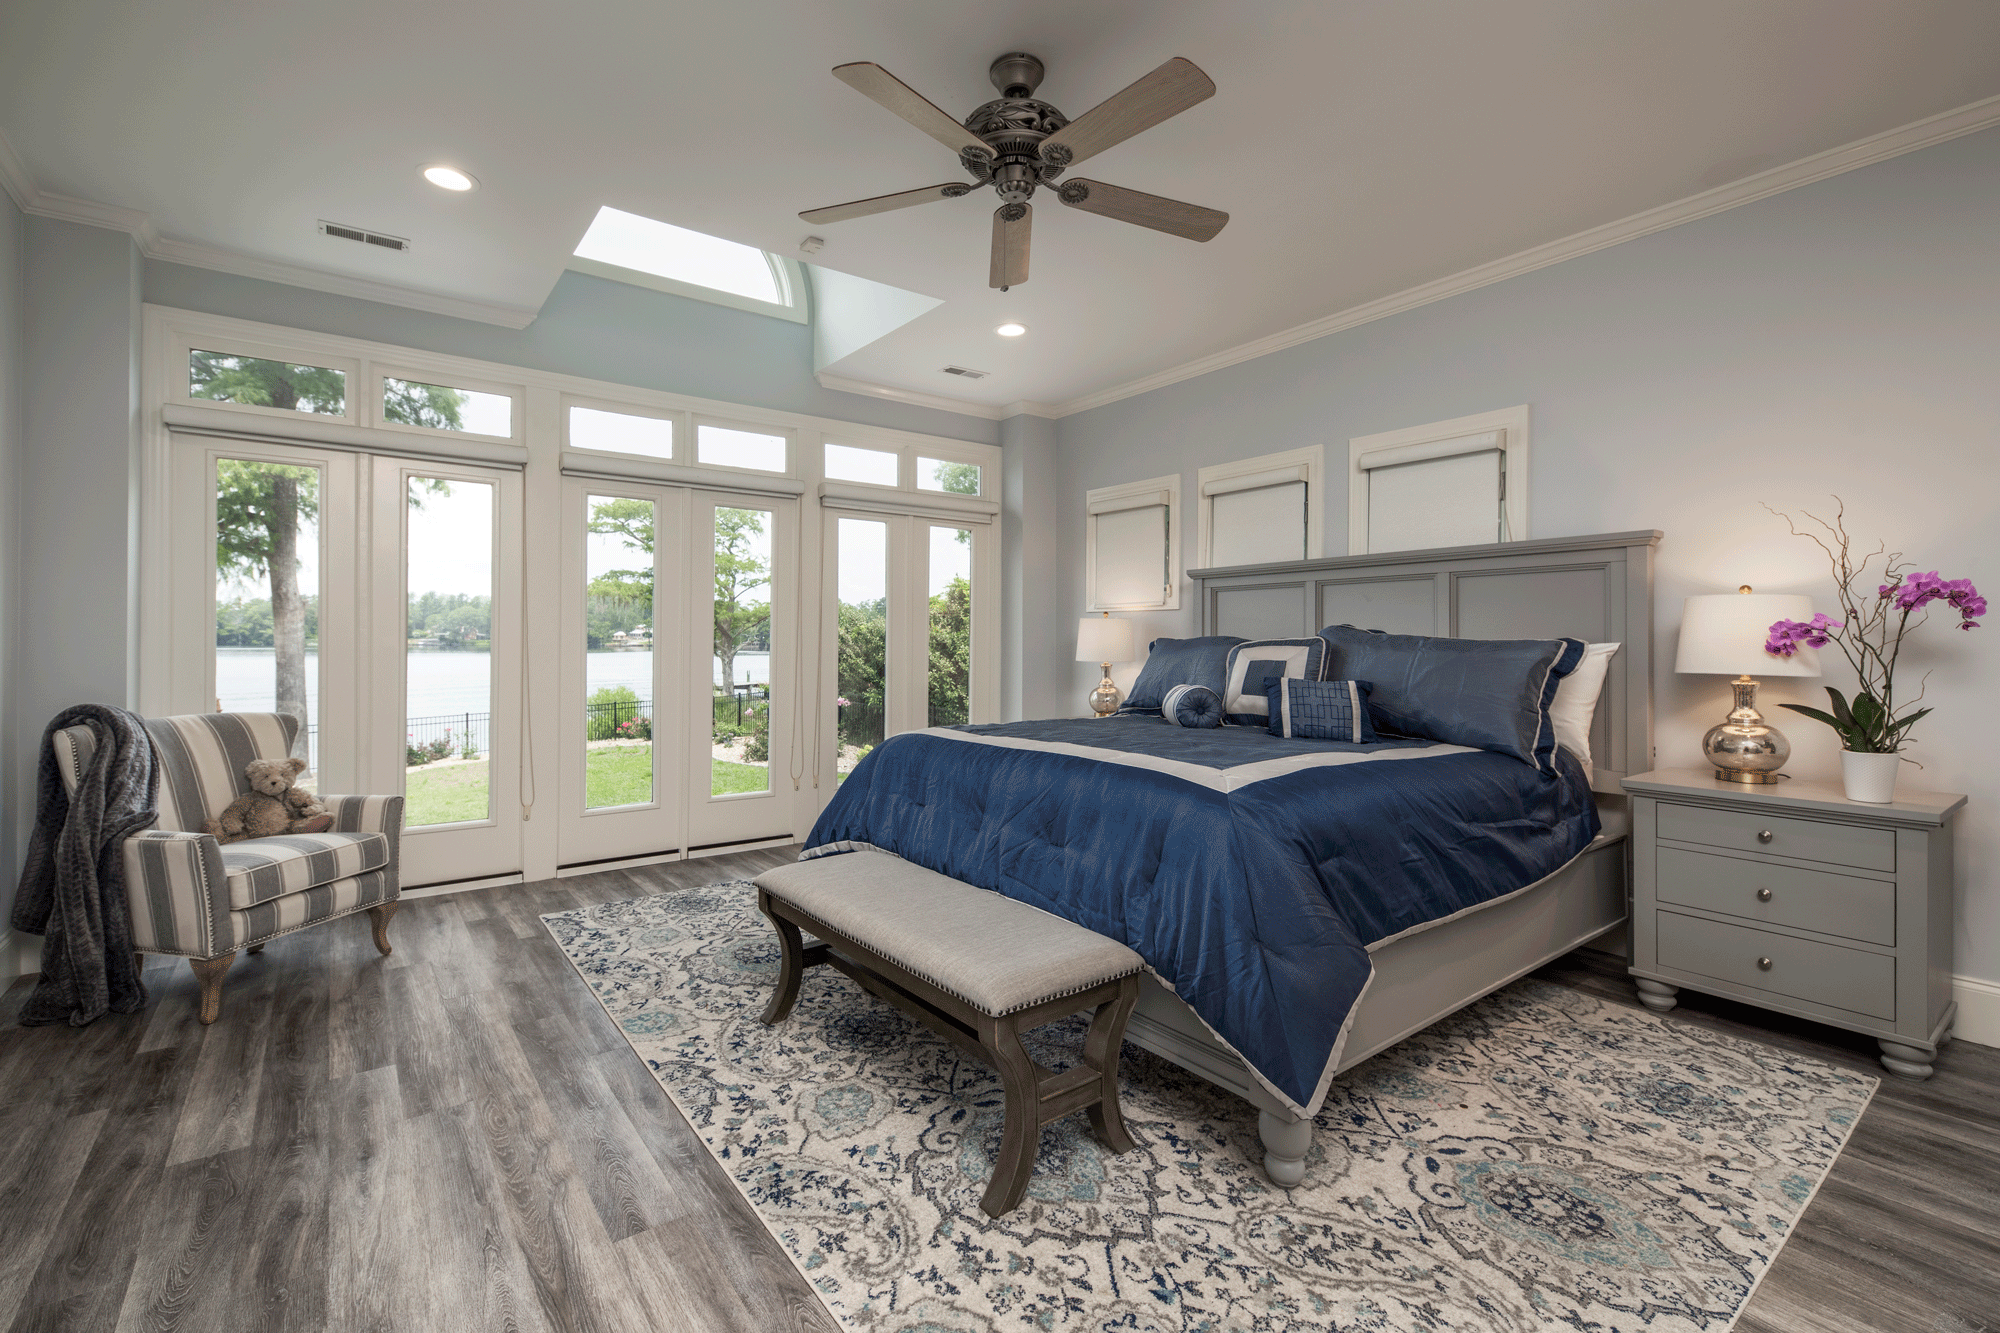 Bedroom design with decor, furniture, lighting, ceiling fan